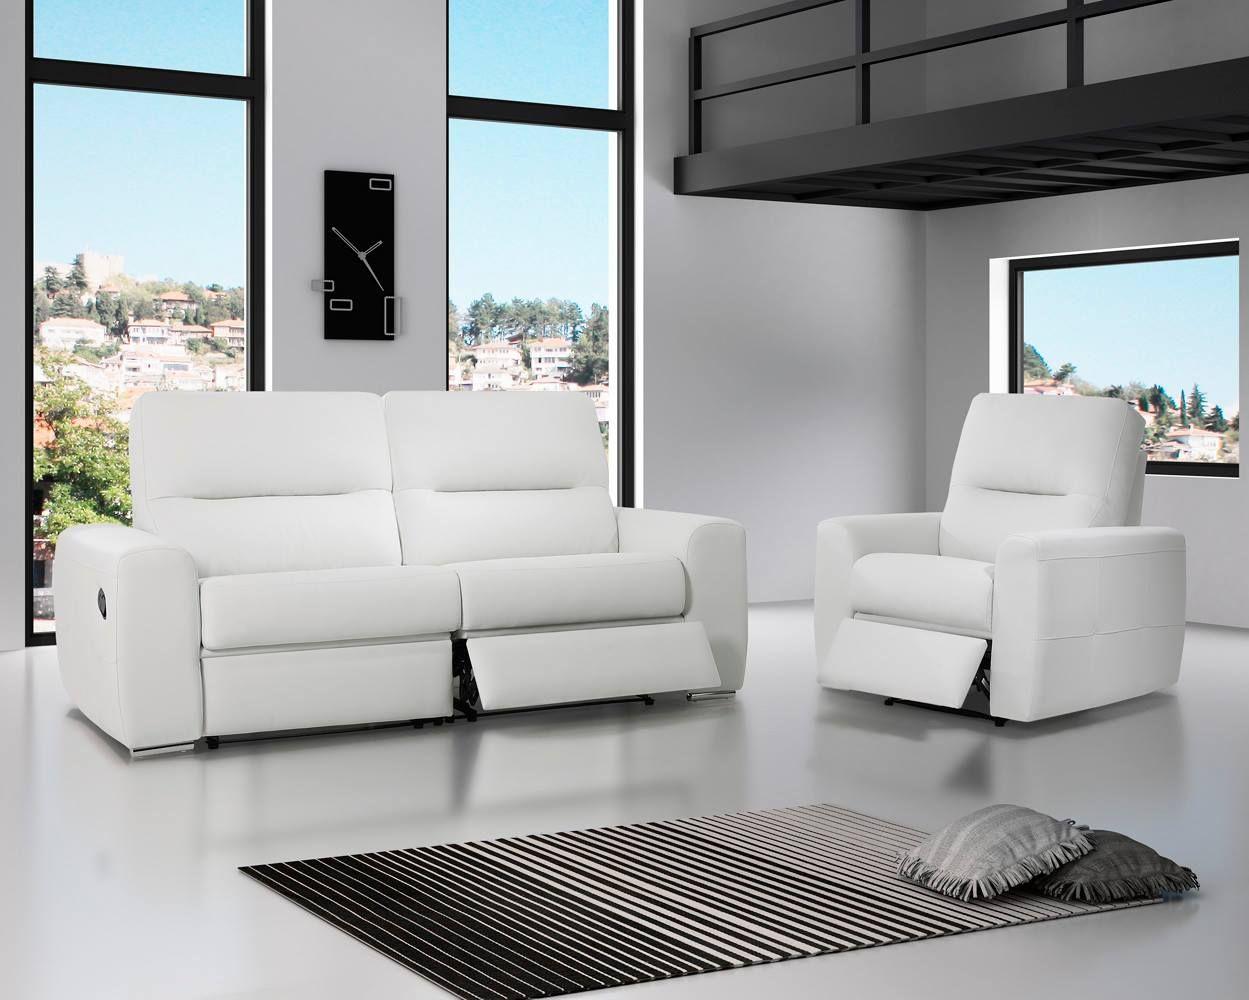 Tienda de muebles en Torredembarra